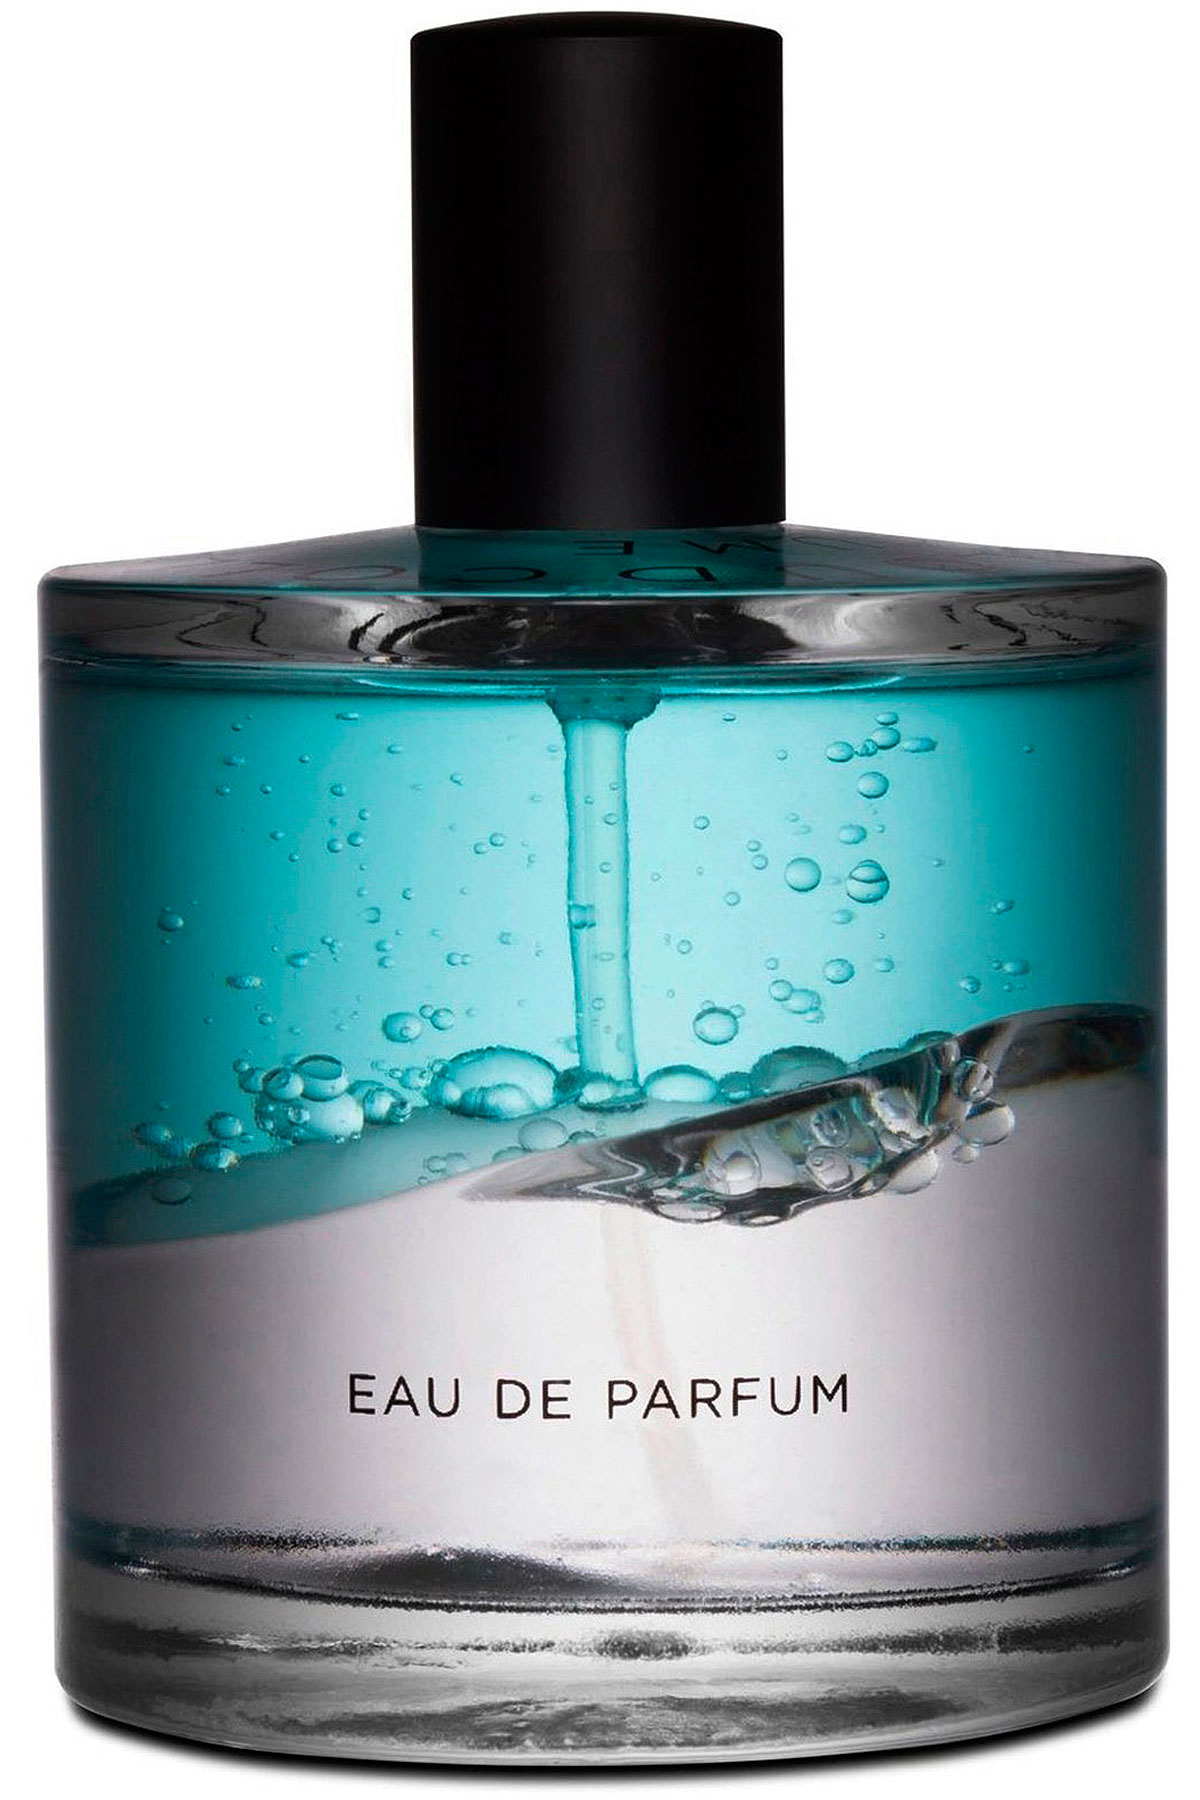 Zarkoperfume Fragrances for Women, Cloud N.2 - Eau De Parfum - 100 Ml, 2019, 100 ml